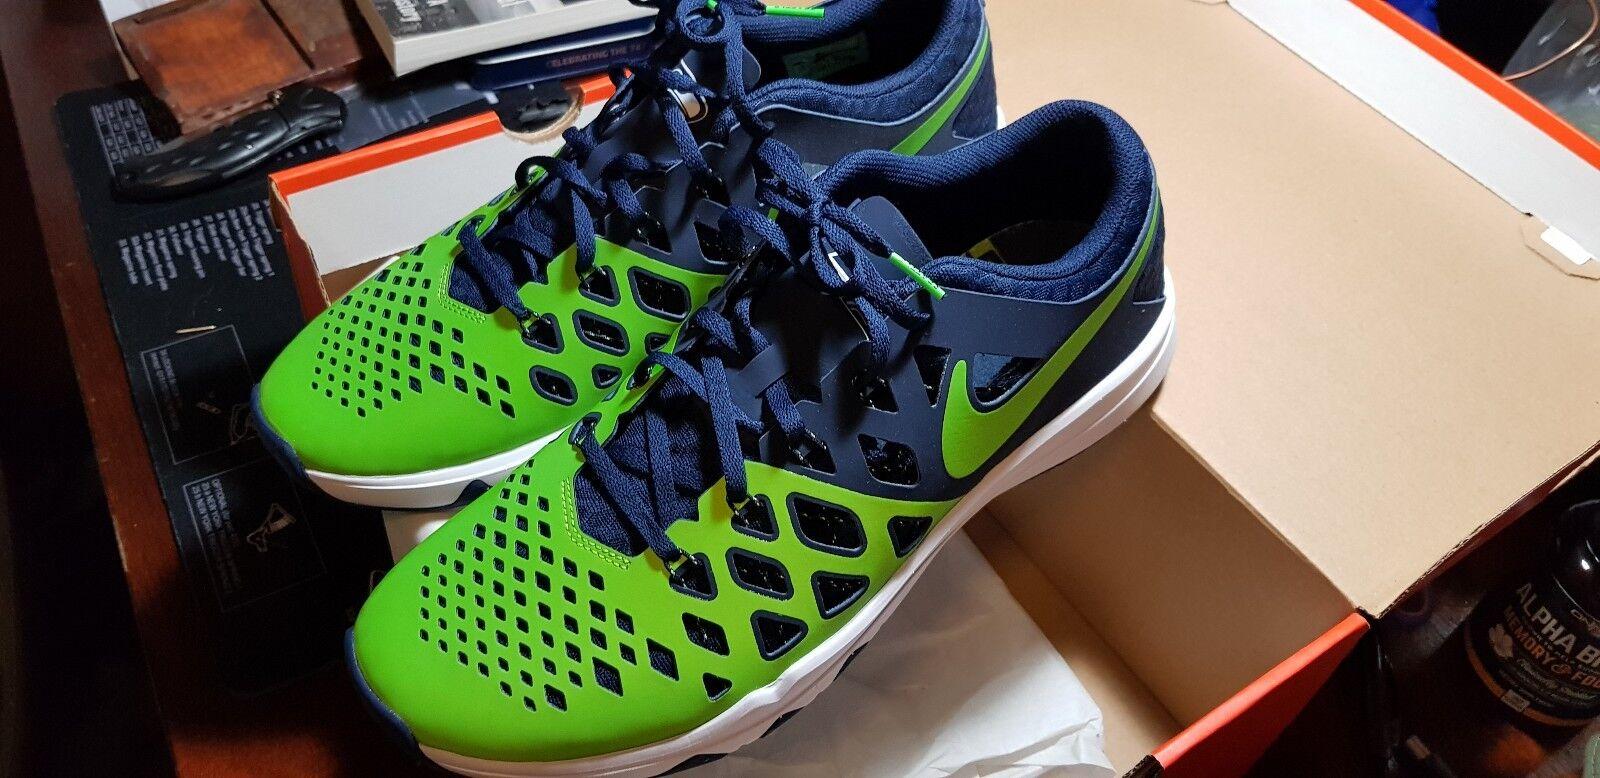 Sz 12.5 Nike Train Speed 4 AMP NFL Seattle Seahawks Athletic shoes yeezy jordan